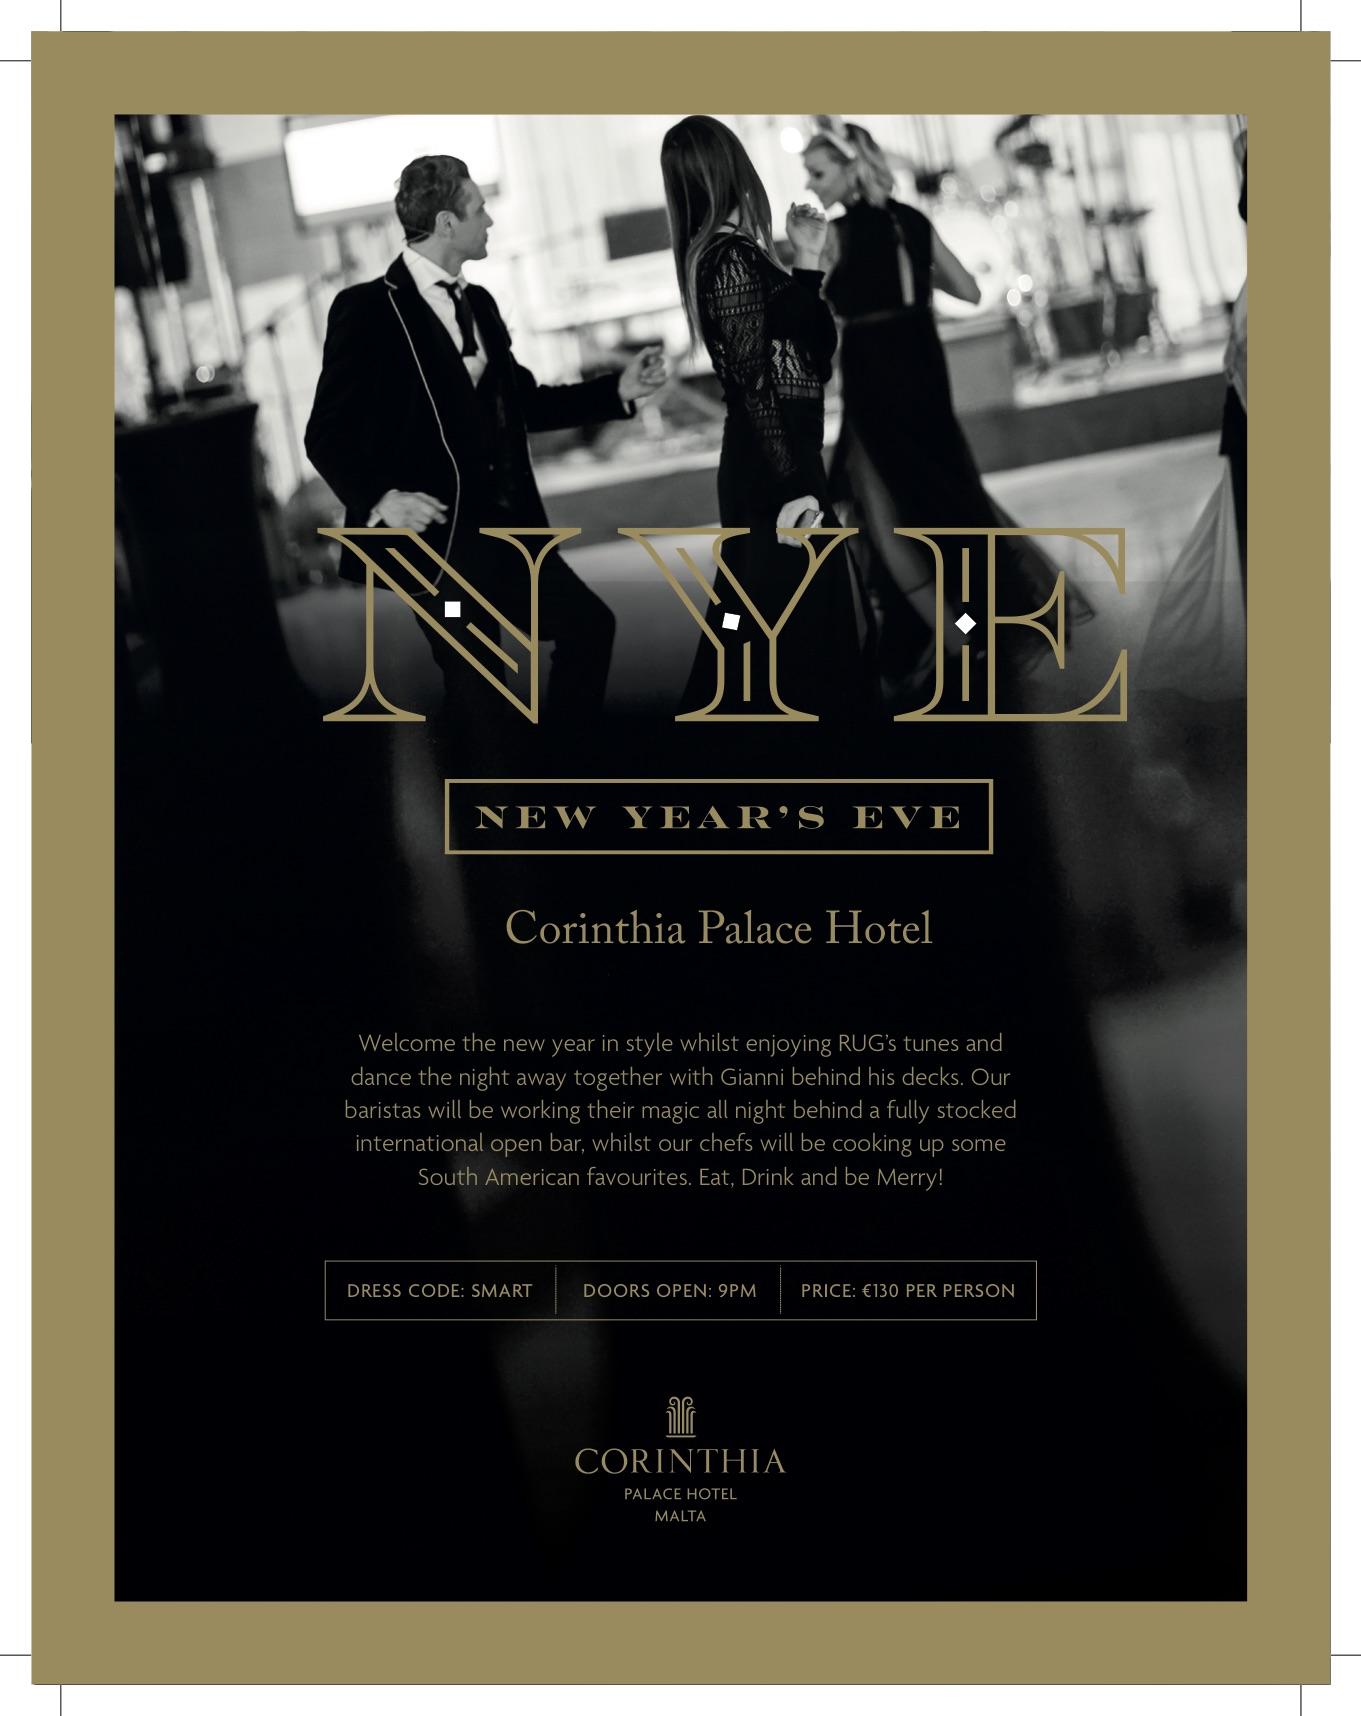 NYE at the Corinthia Palace flyer